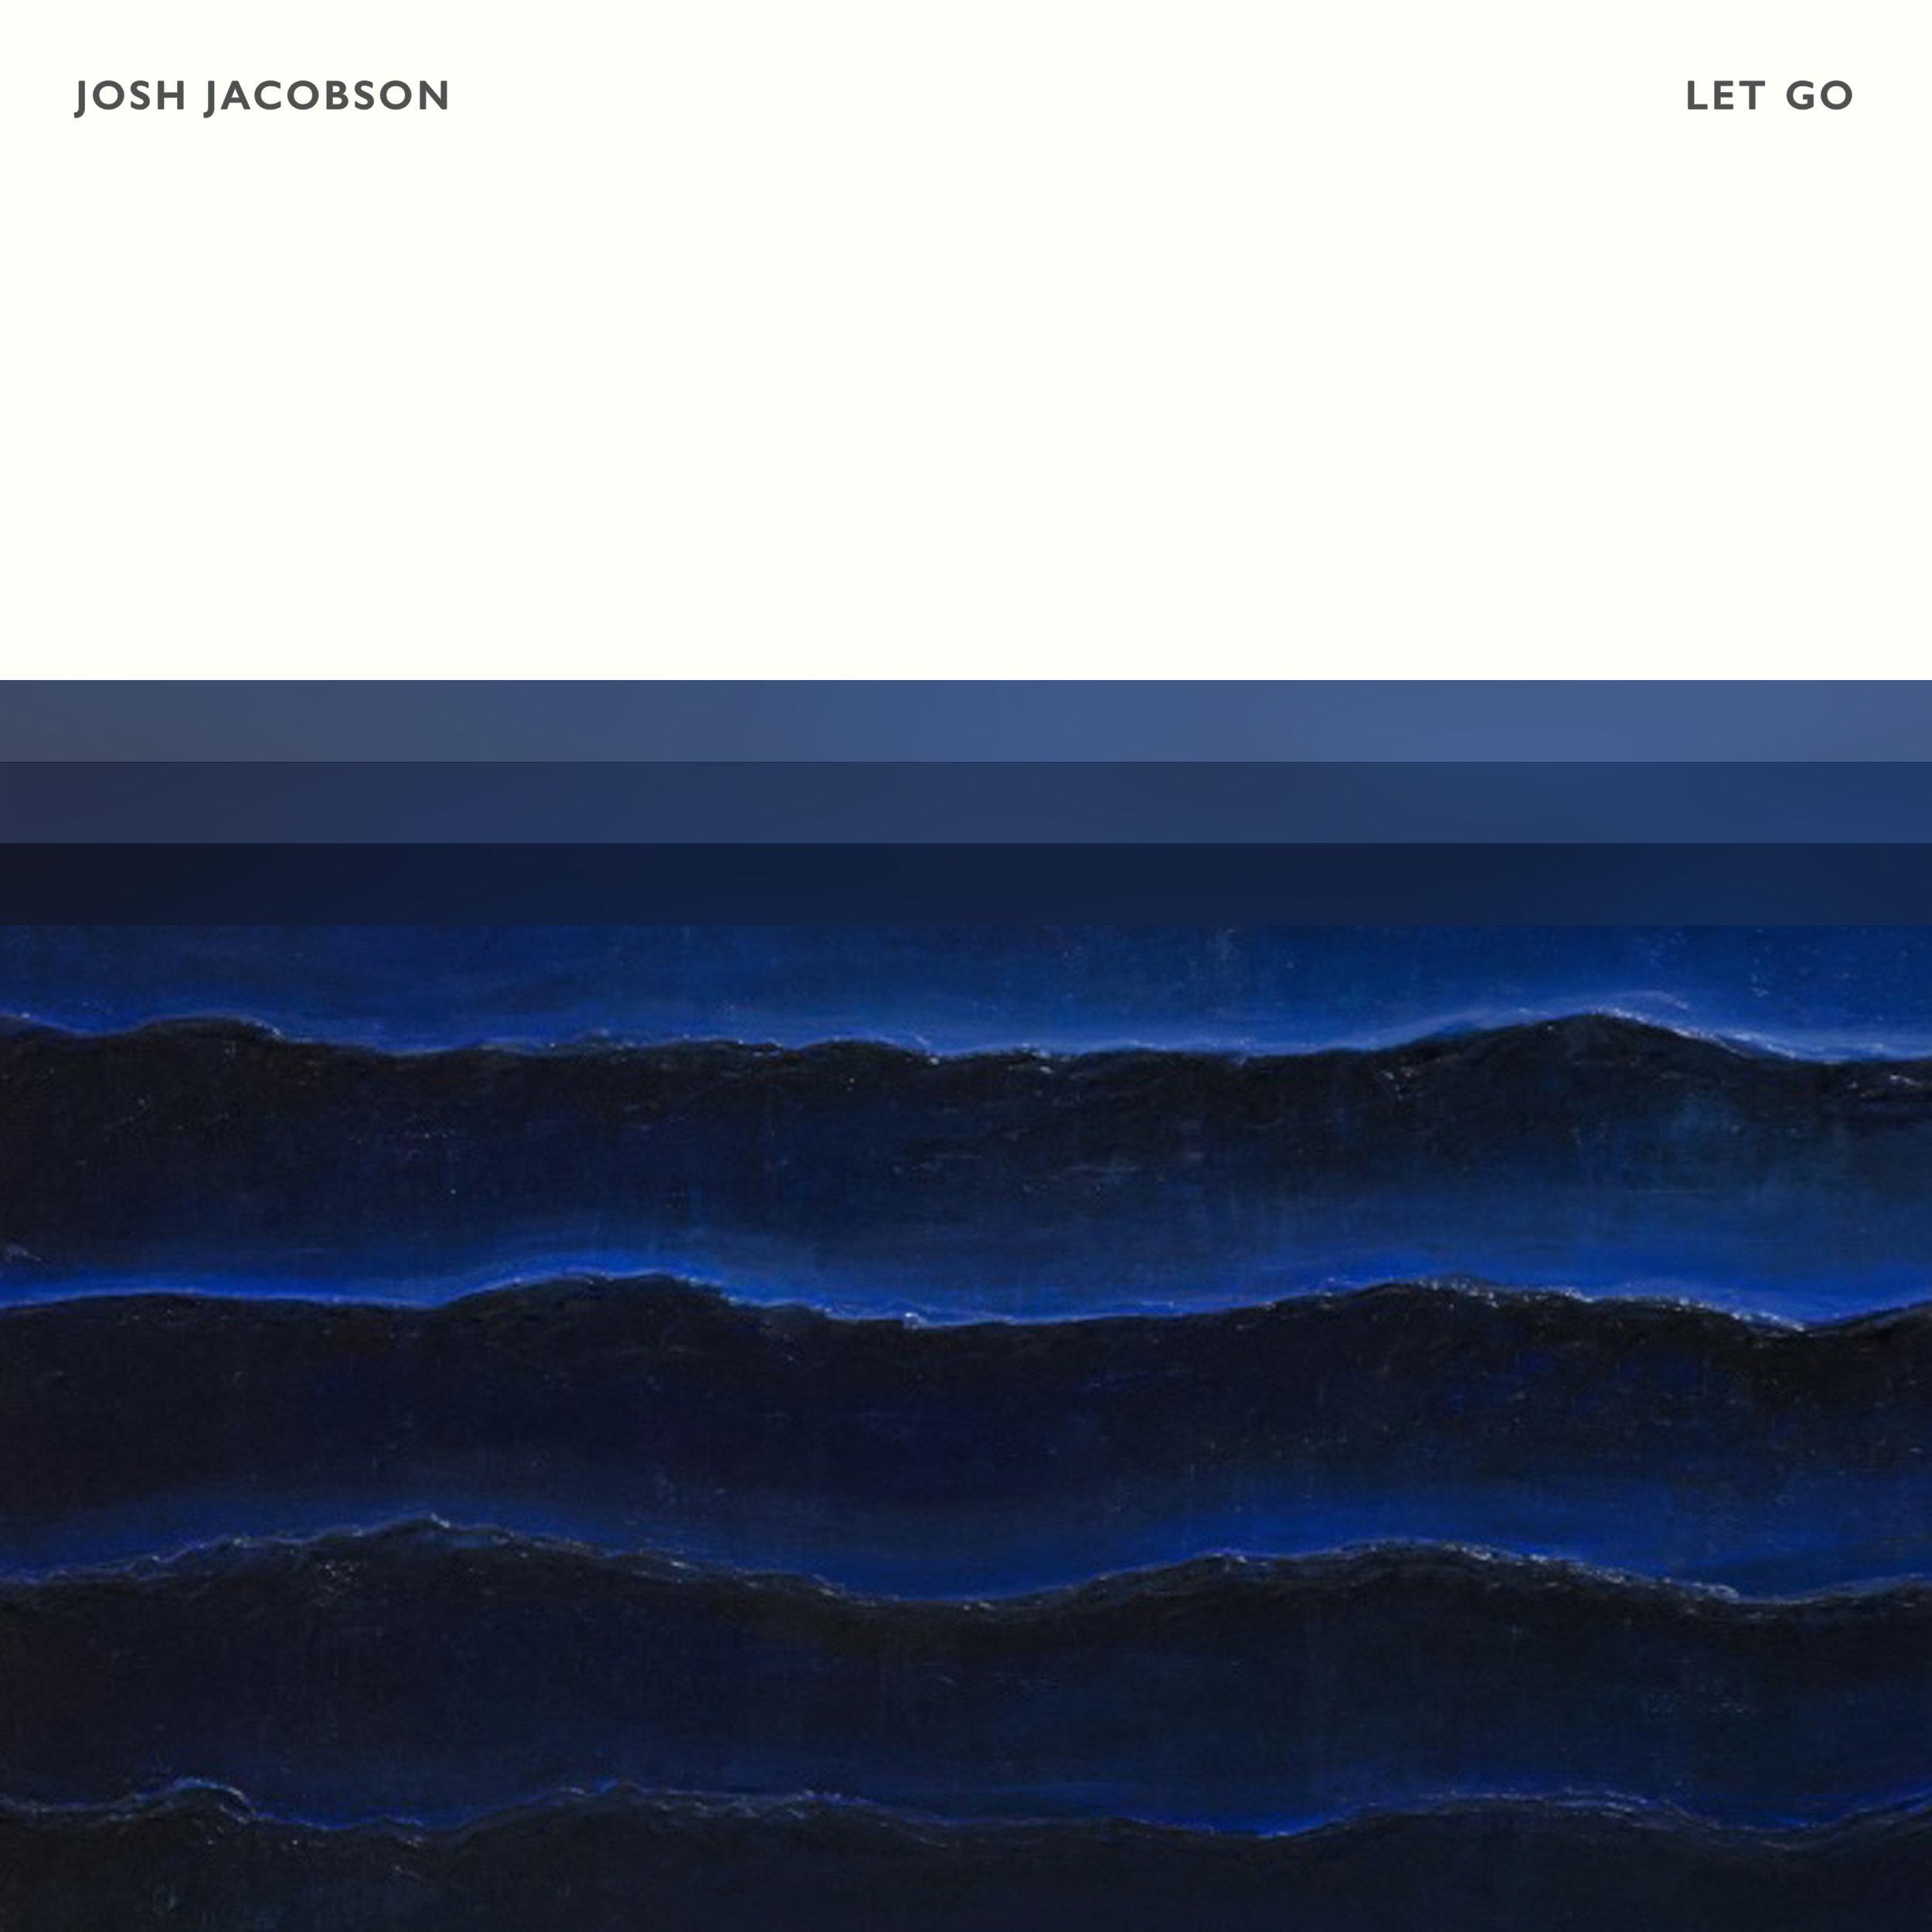 Josh Jacobson - Let Go